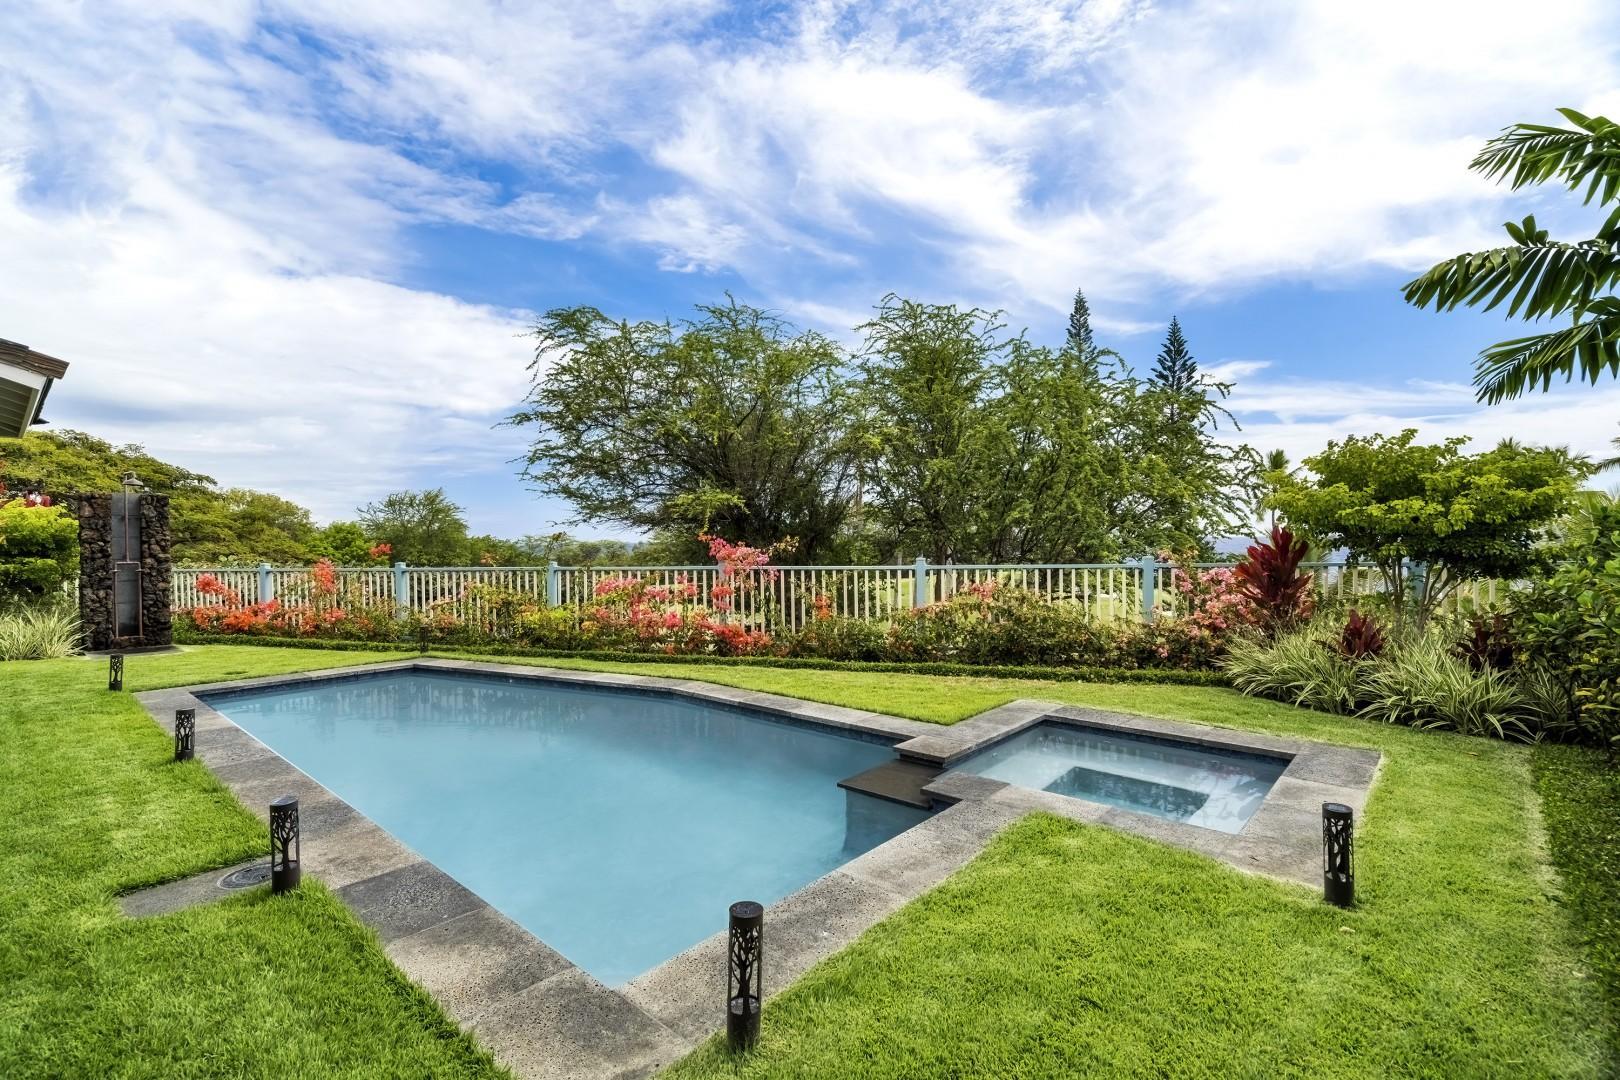 Salt water pool and spa!